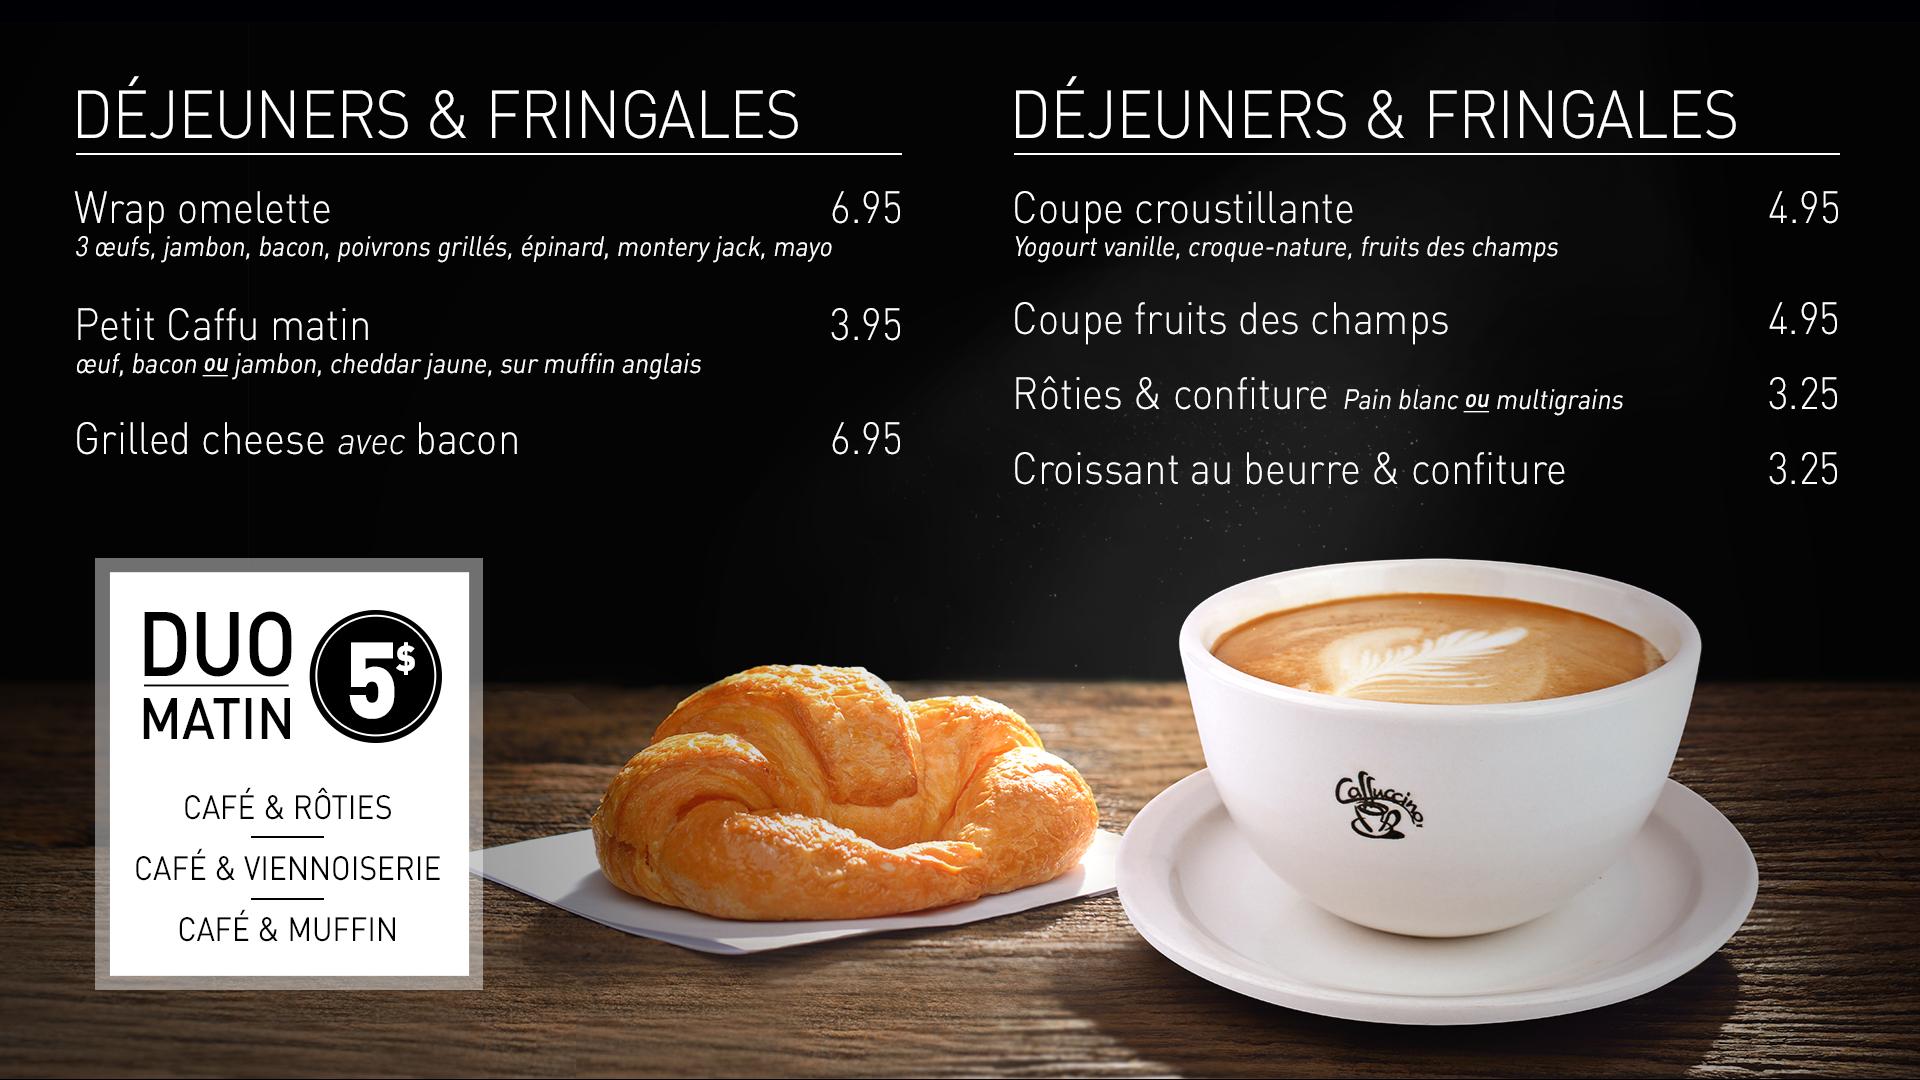 Caffuccino - Menu bistro - Déjeuners & fringales